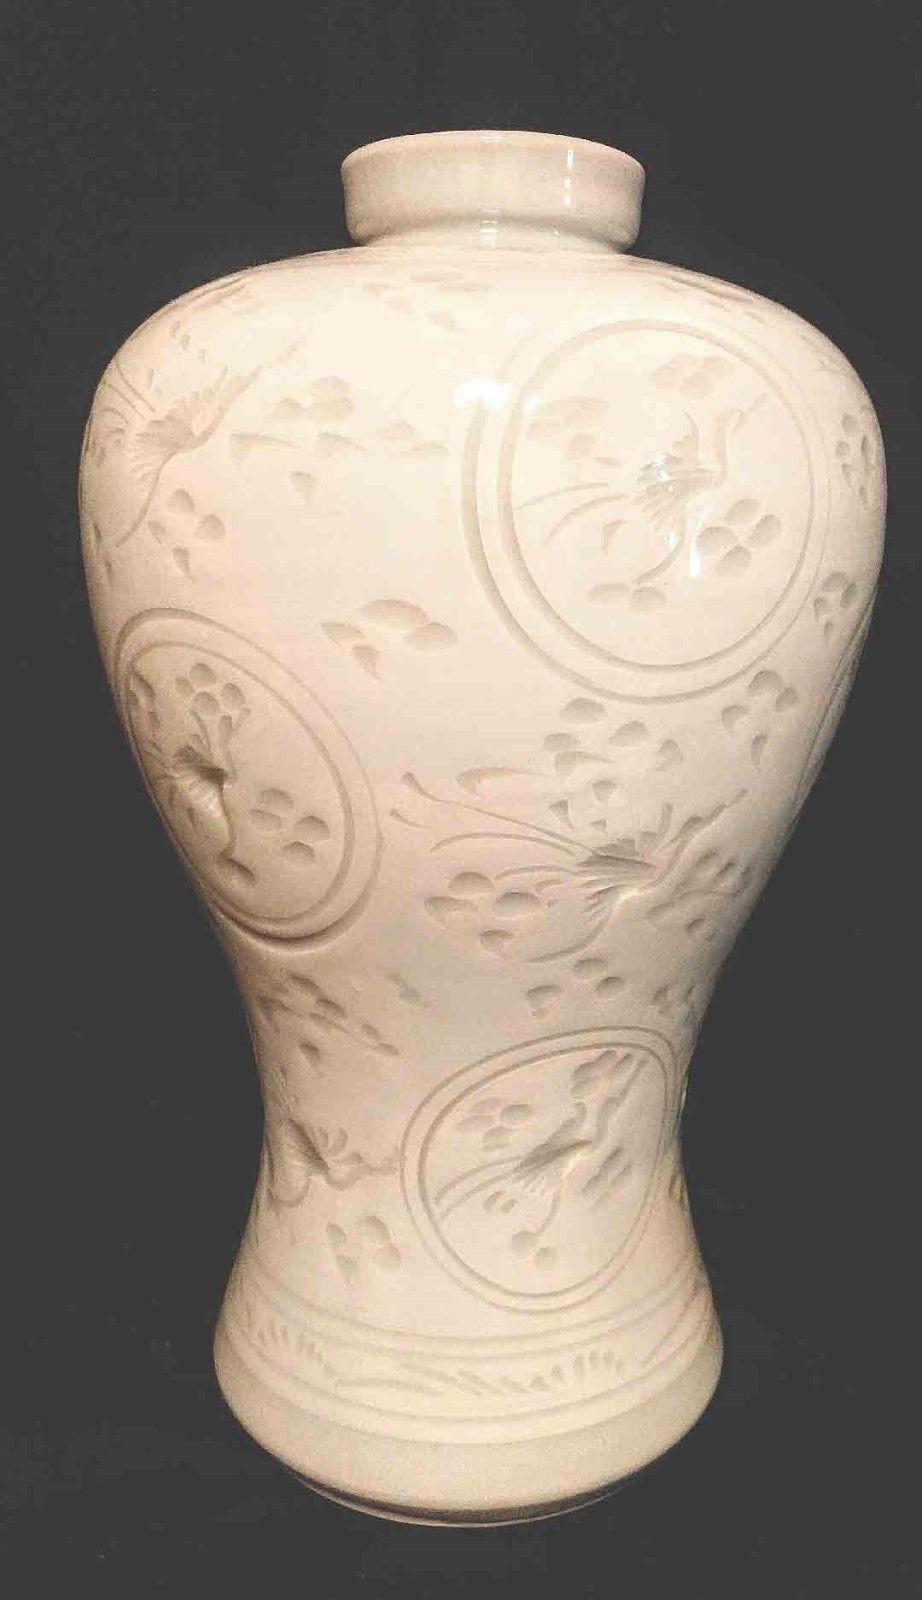 extra large ceramic vases of large collectible vtg korean incised celadon signed vase pottery pot with regard to large collectible vtg korean incised celadon signed vase pottery pot 1 of 6 see more